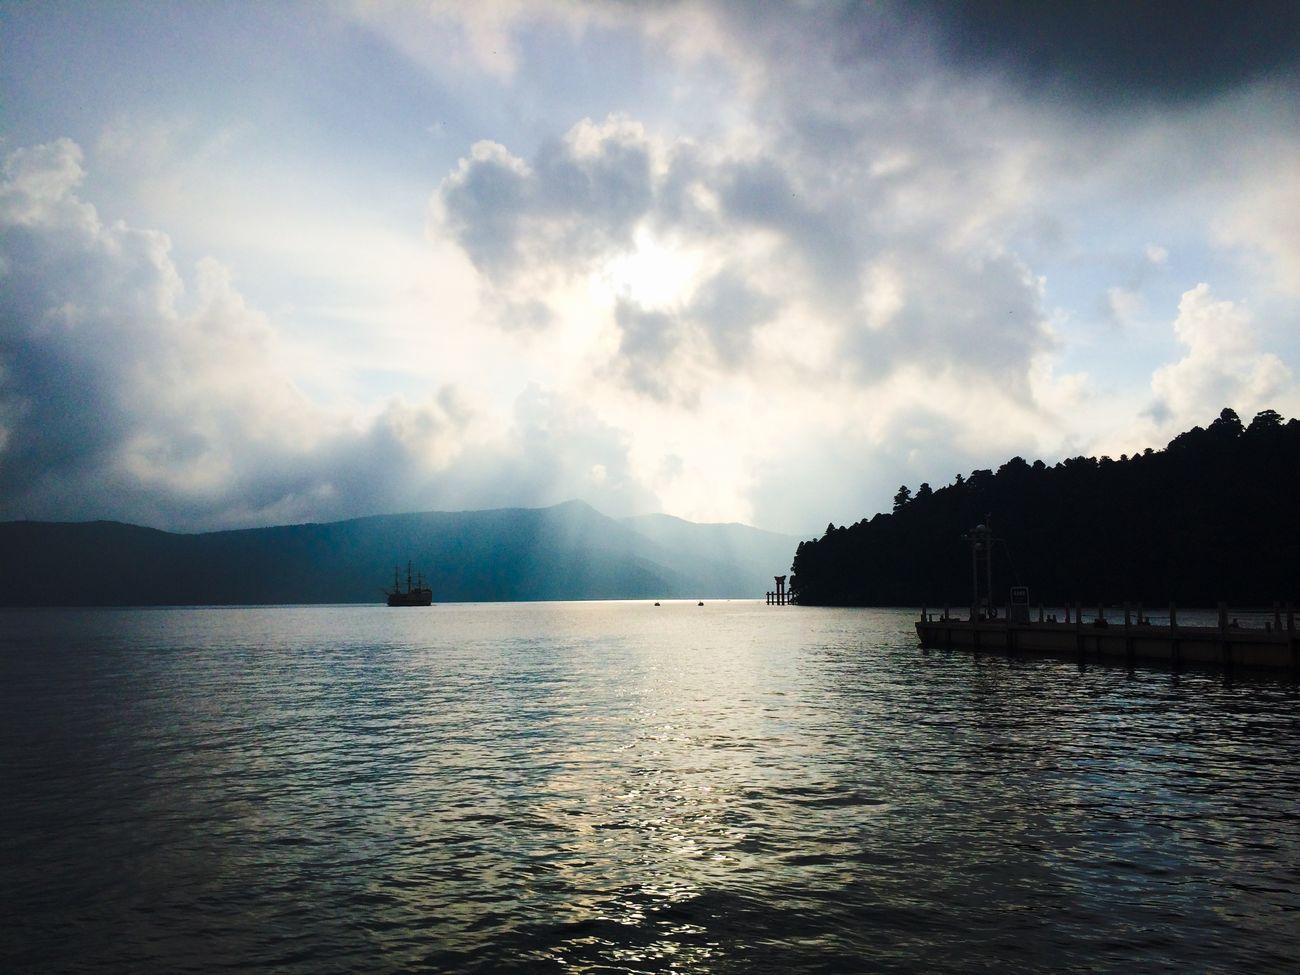 Lake Water Lake Ashi Light Shafts Of Light Clouds Torii Gate Hakone Ship IPhoneography